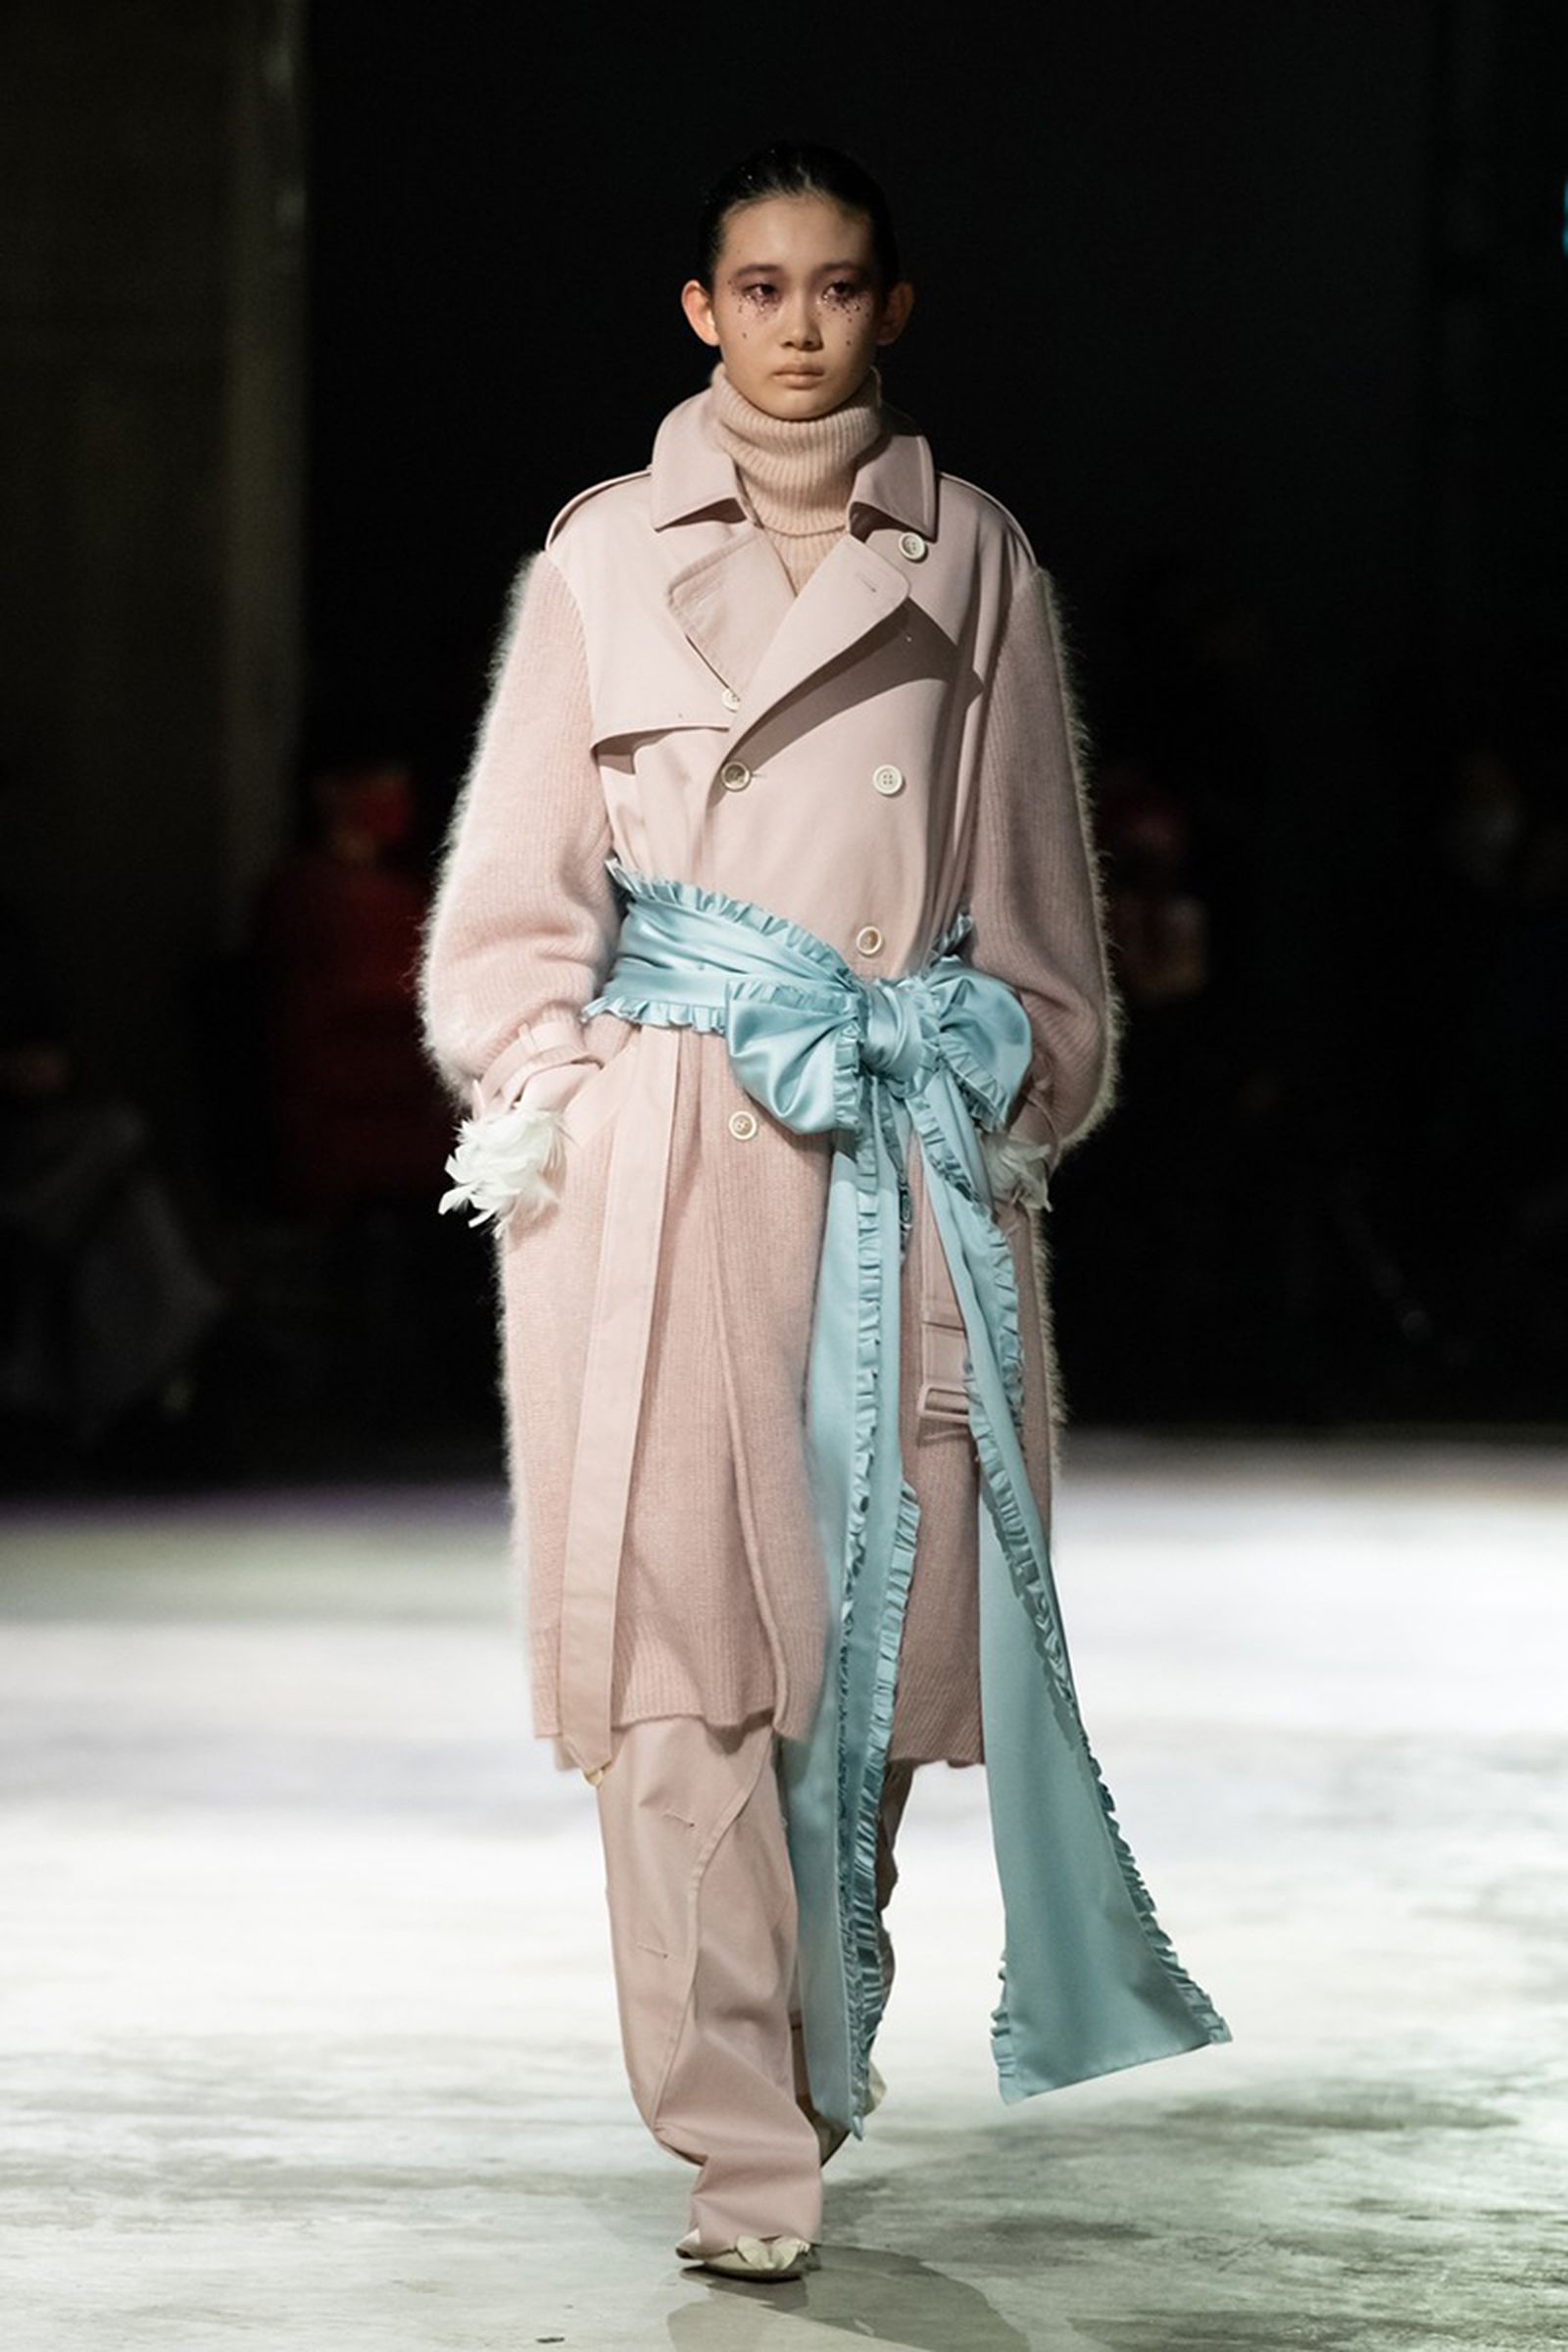 undercover-fw21-show-tokyo-fashion-week-13